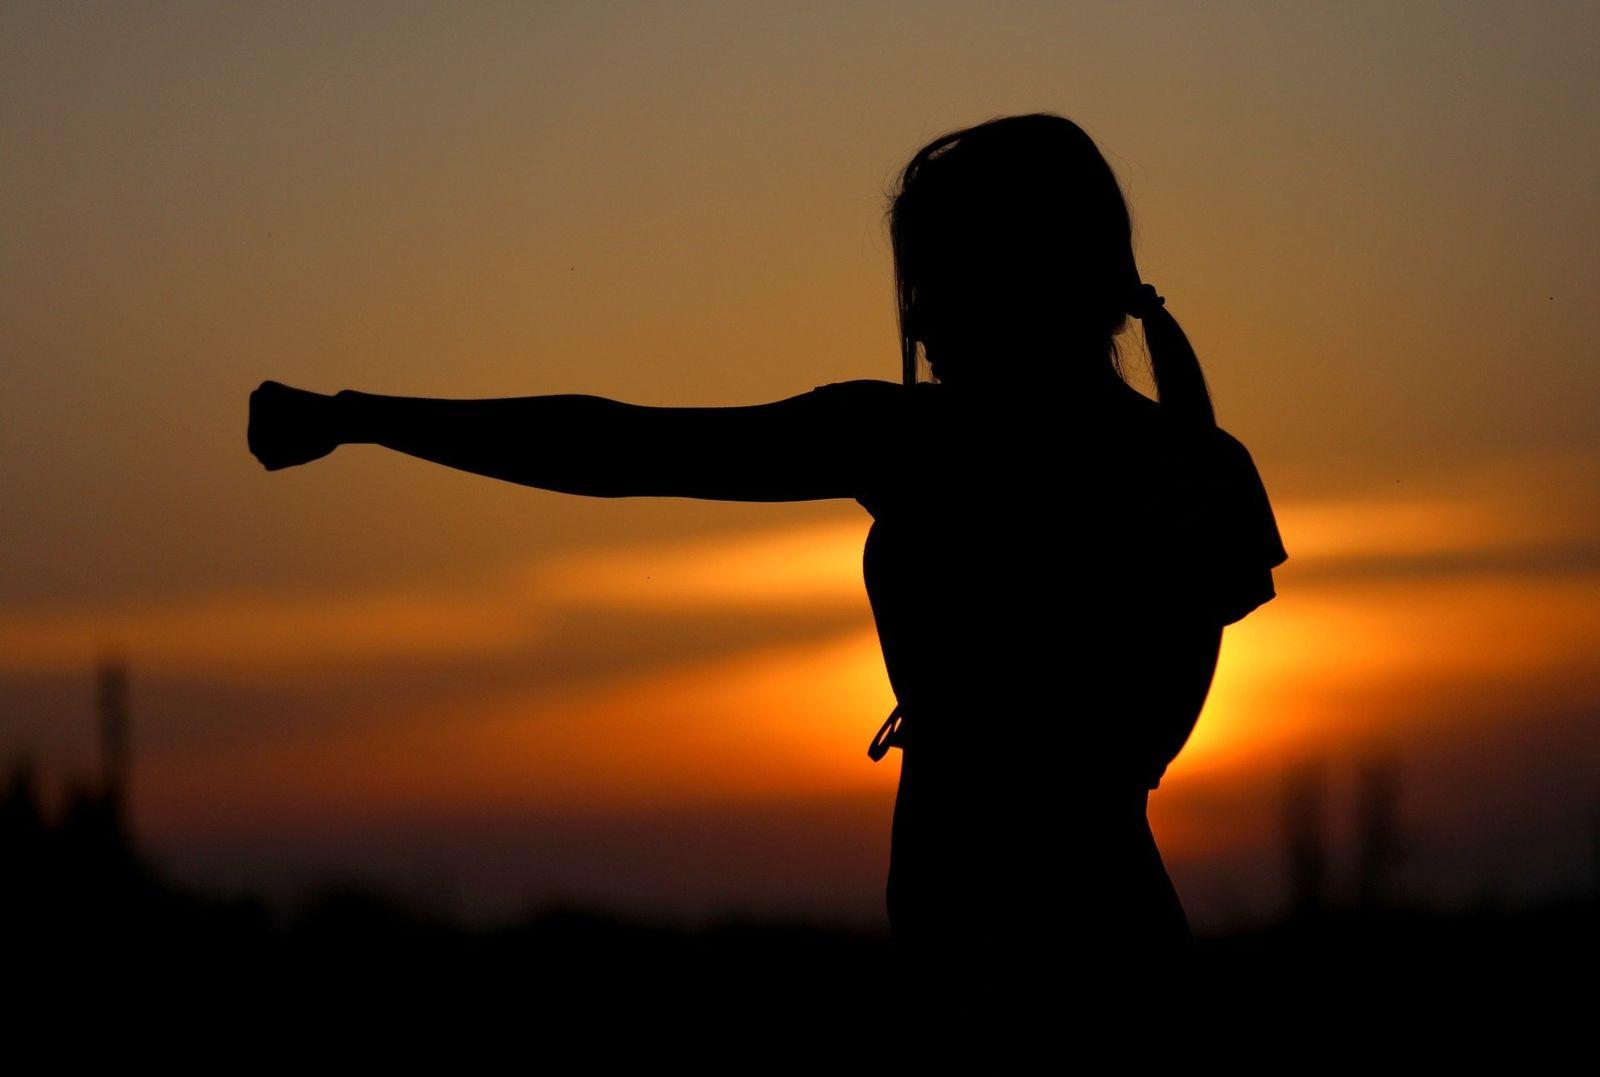 Taekwondo Forms Classes in Exton and Malvern PA